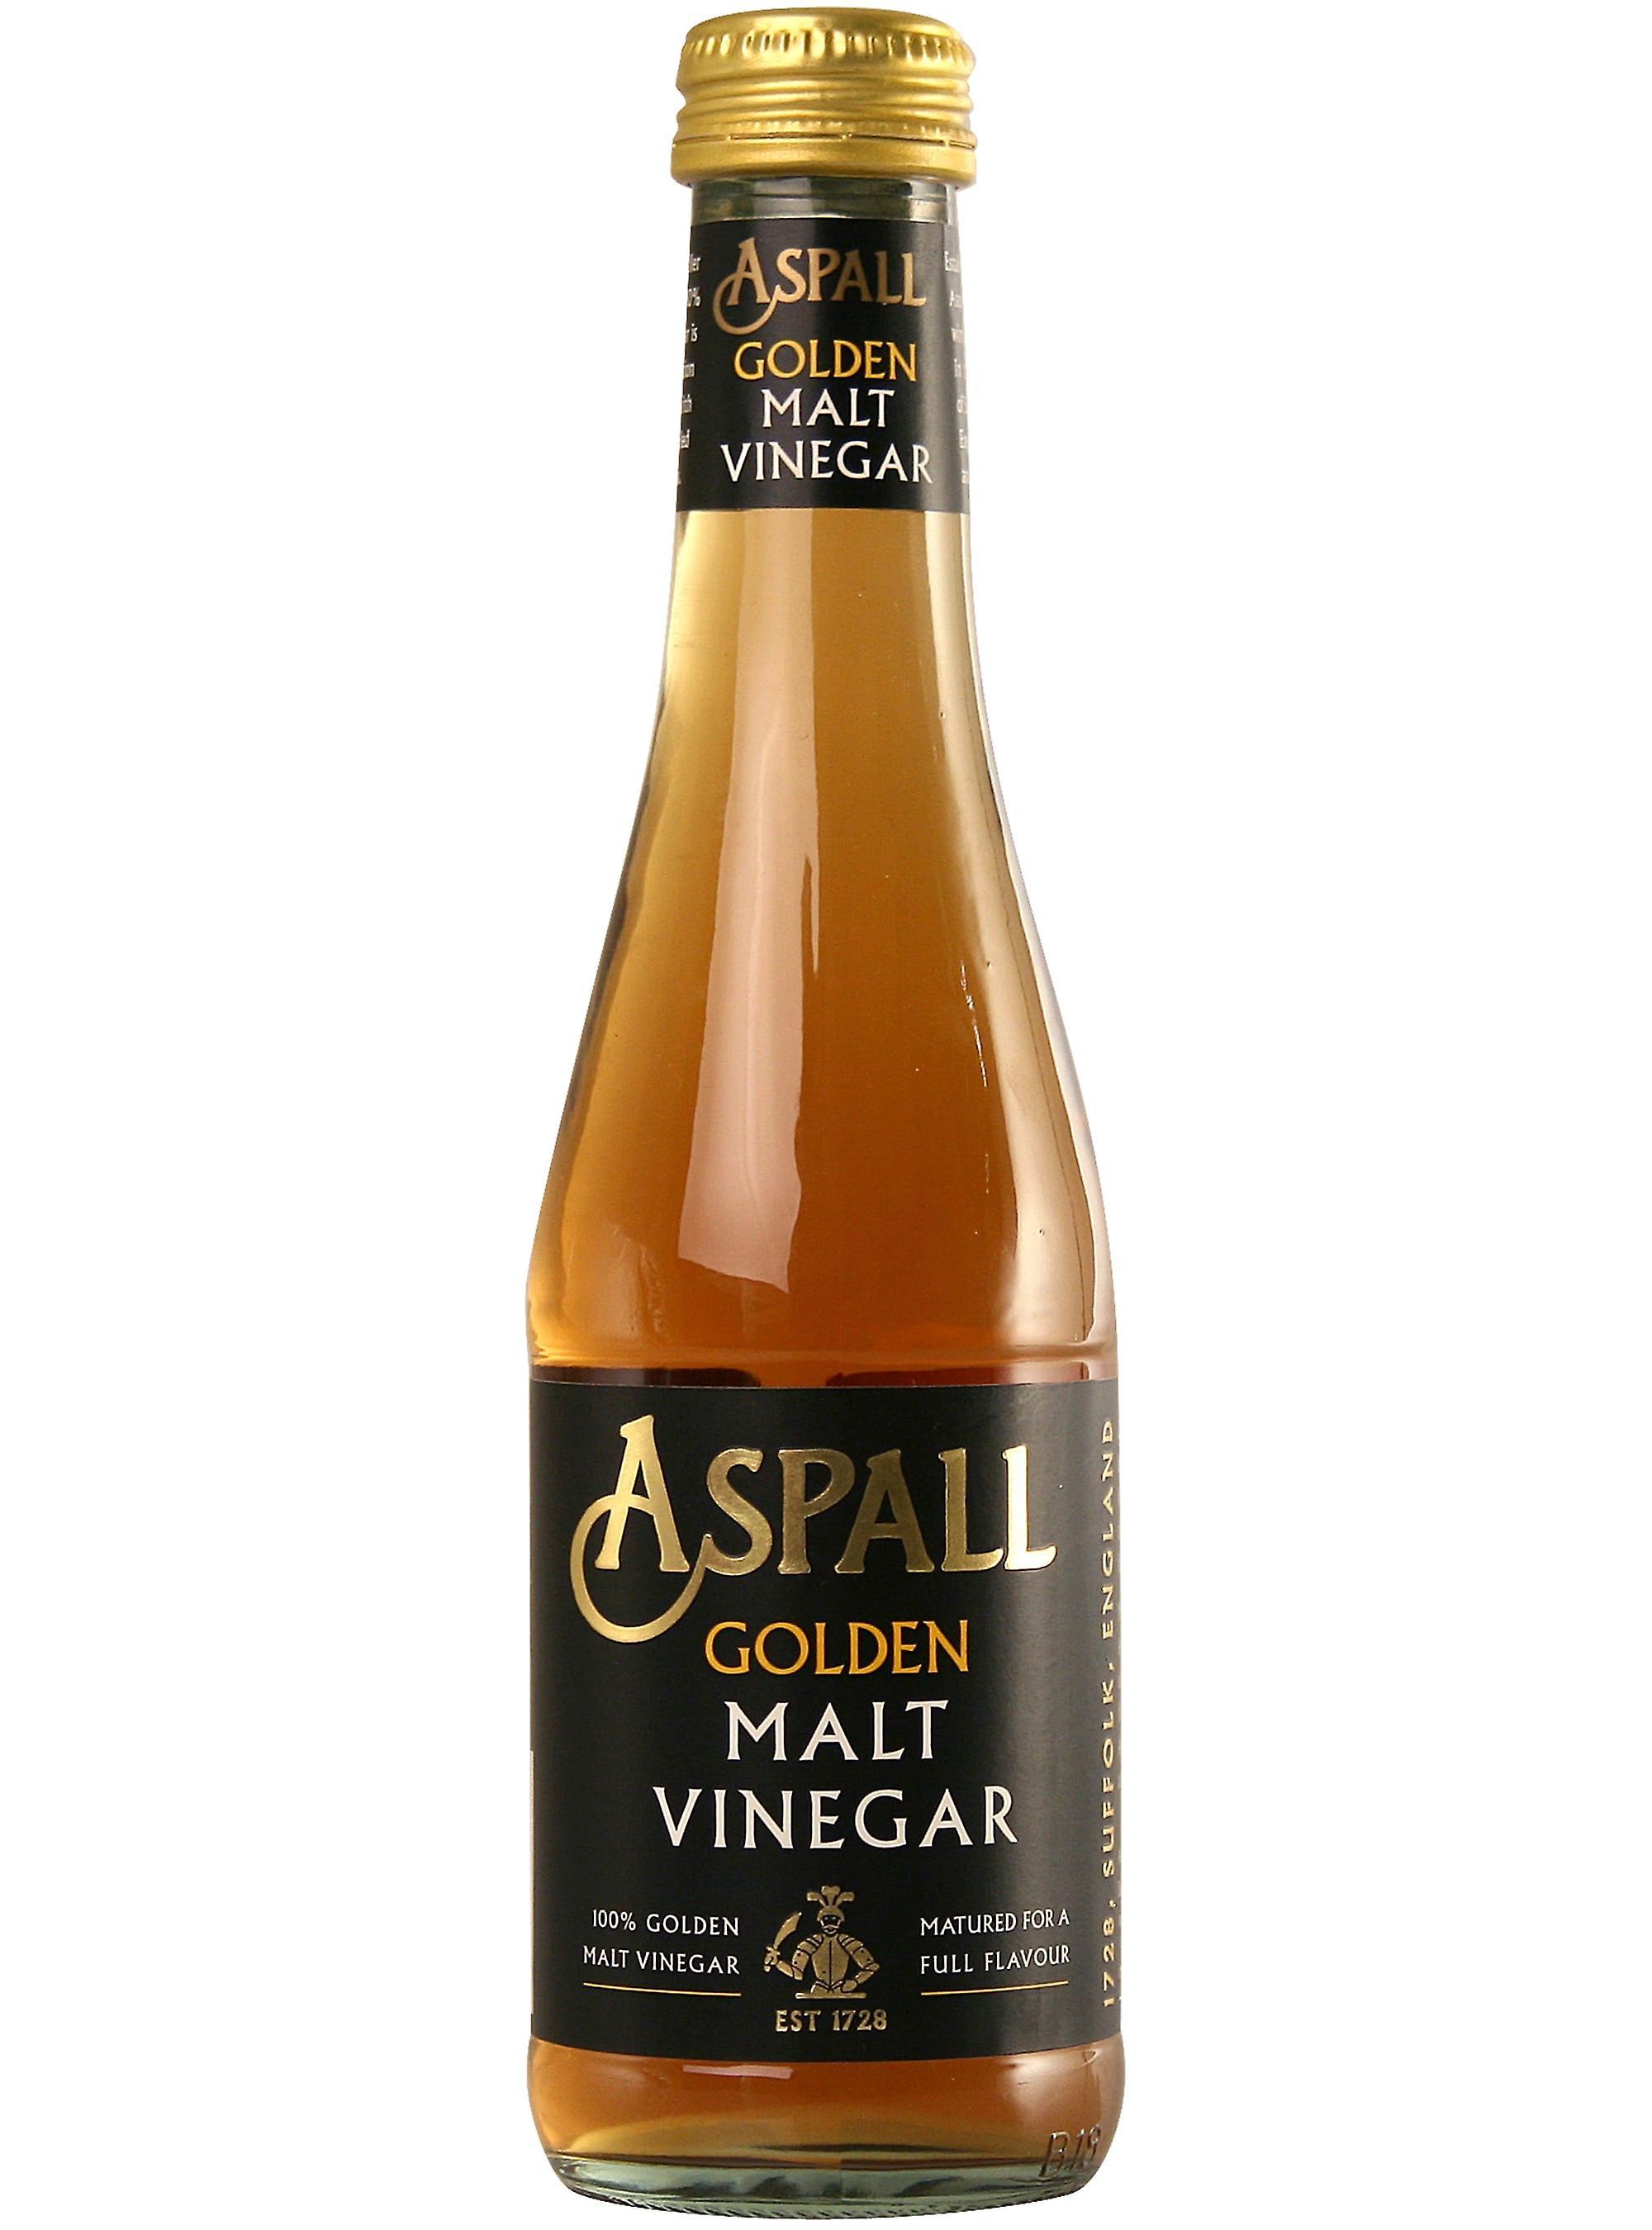 Aspalls Golden Malt Vinegar